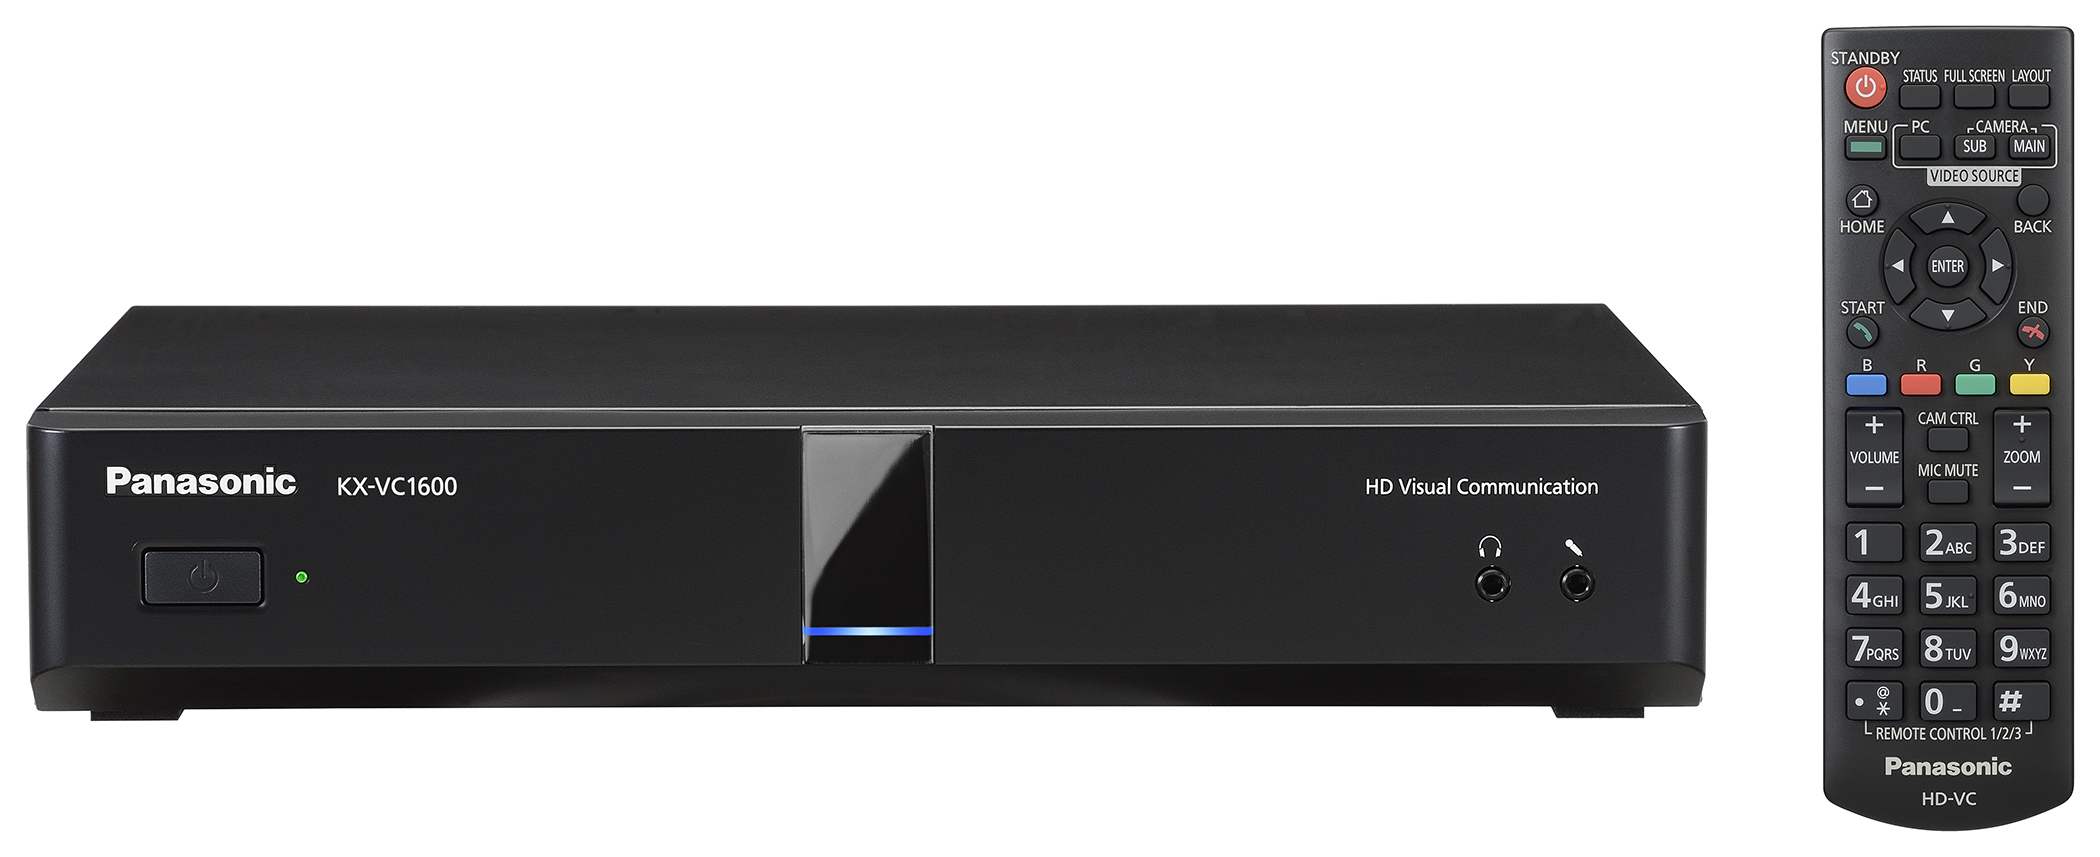 KX VC1600 01 remote english Видео конференц связь